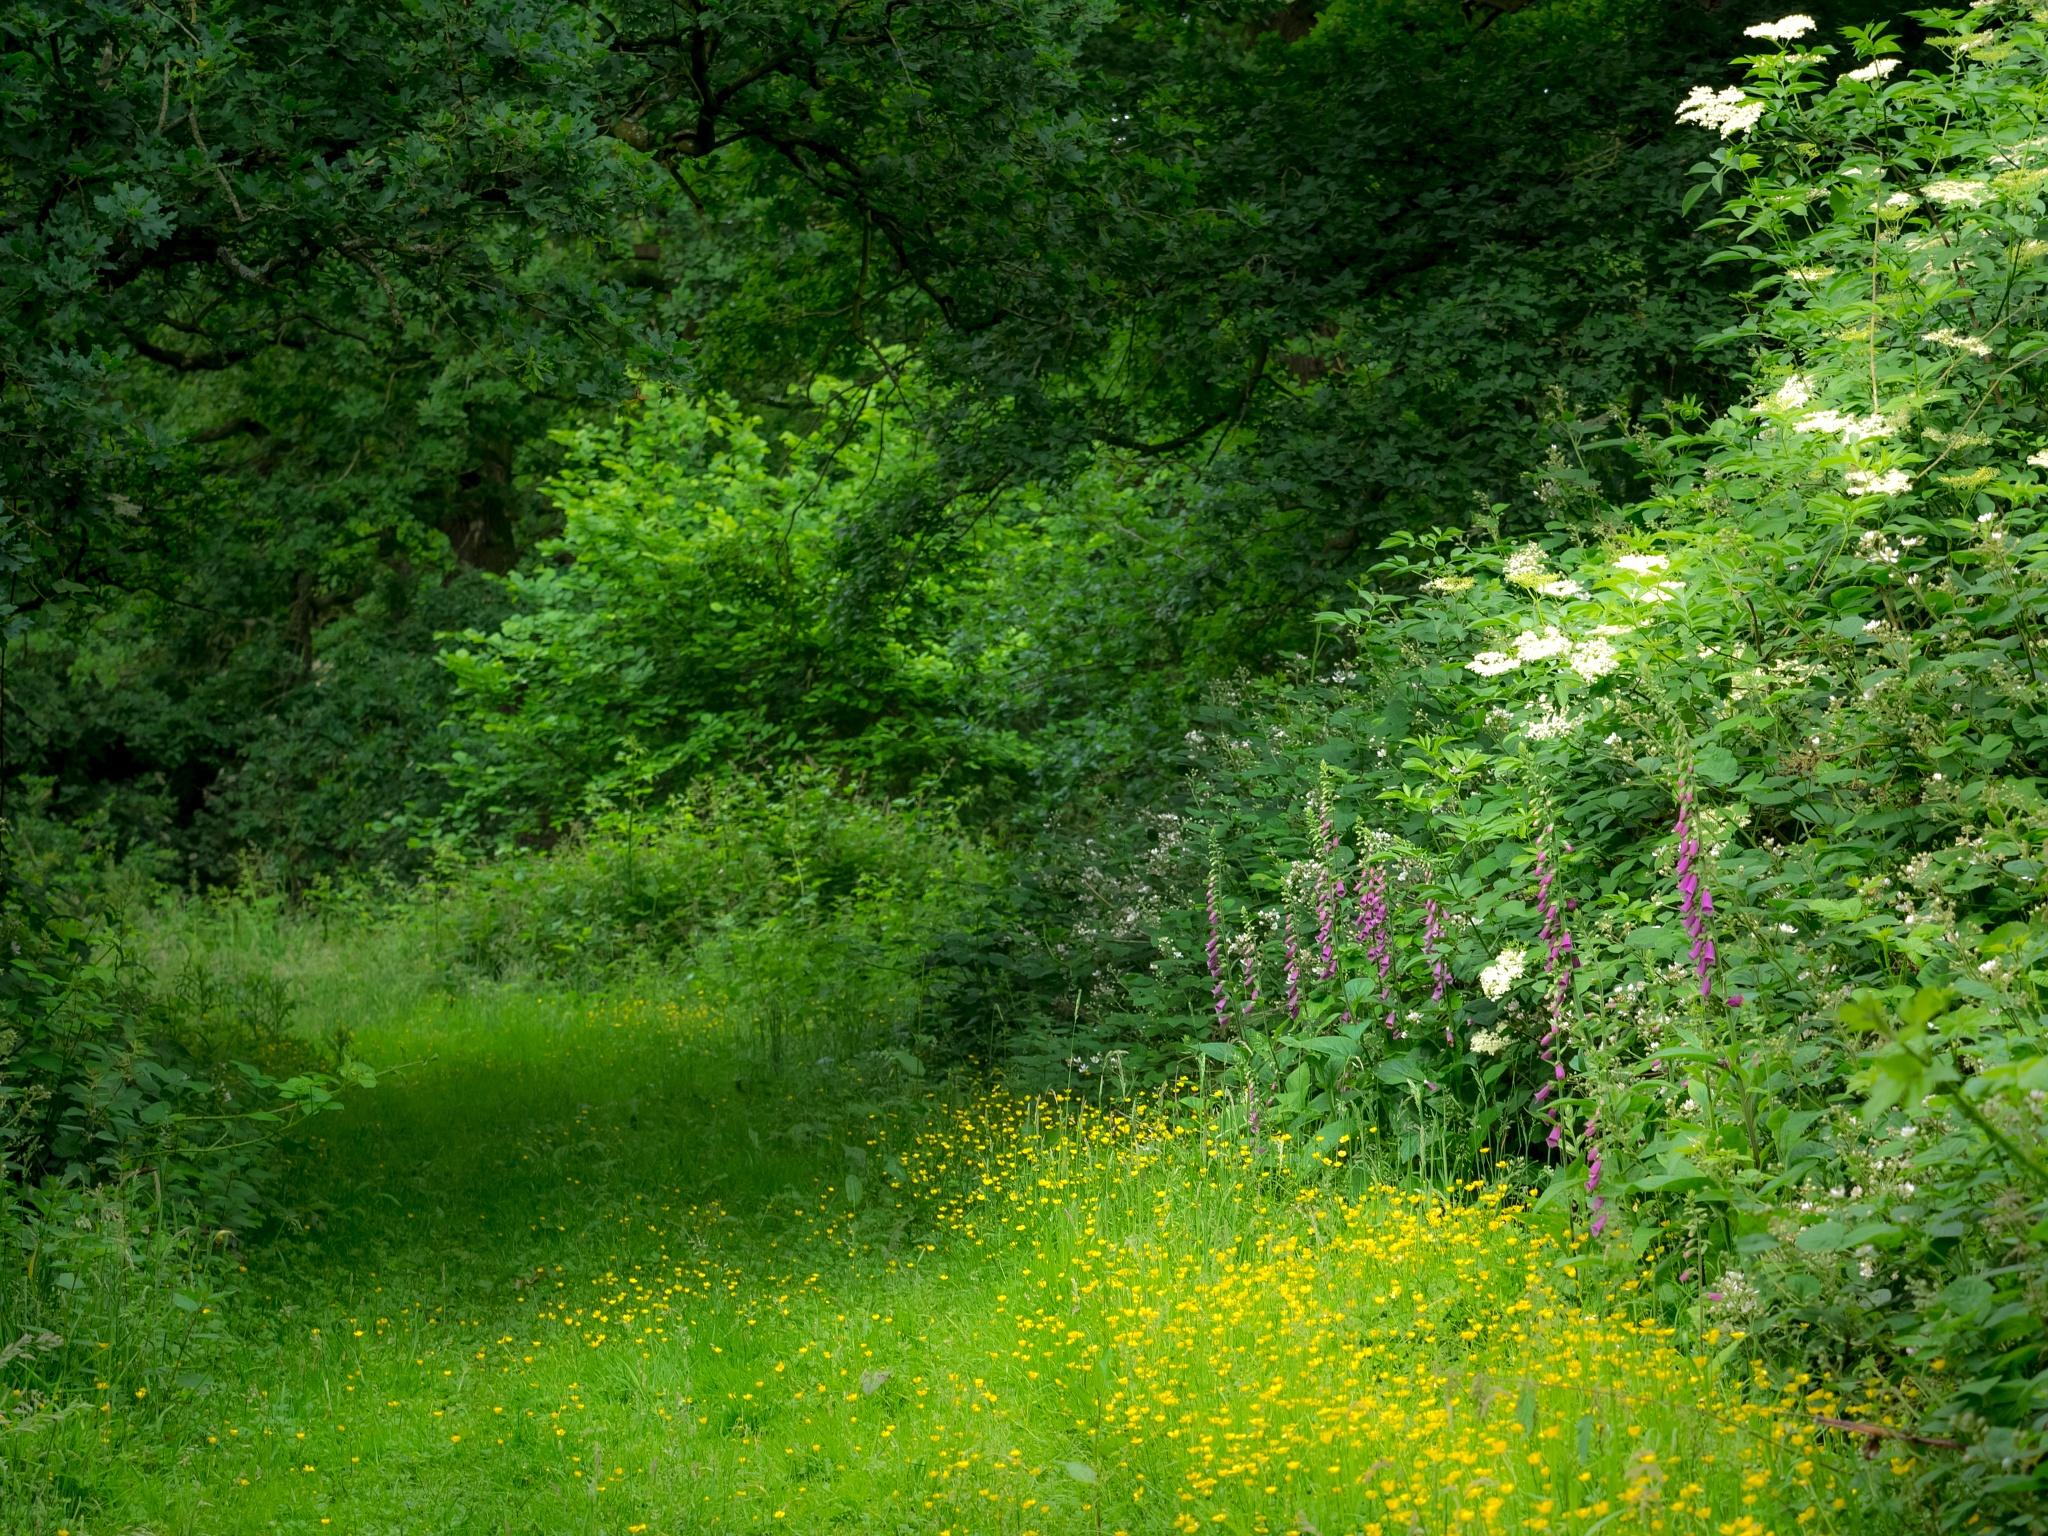 Woodland edge by Sarah Walters